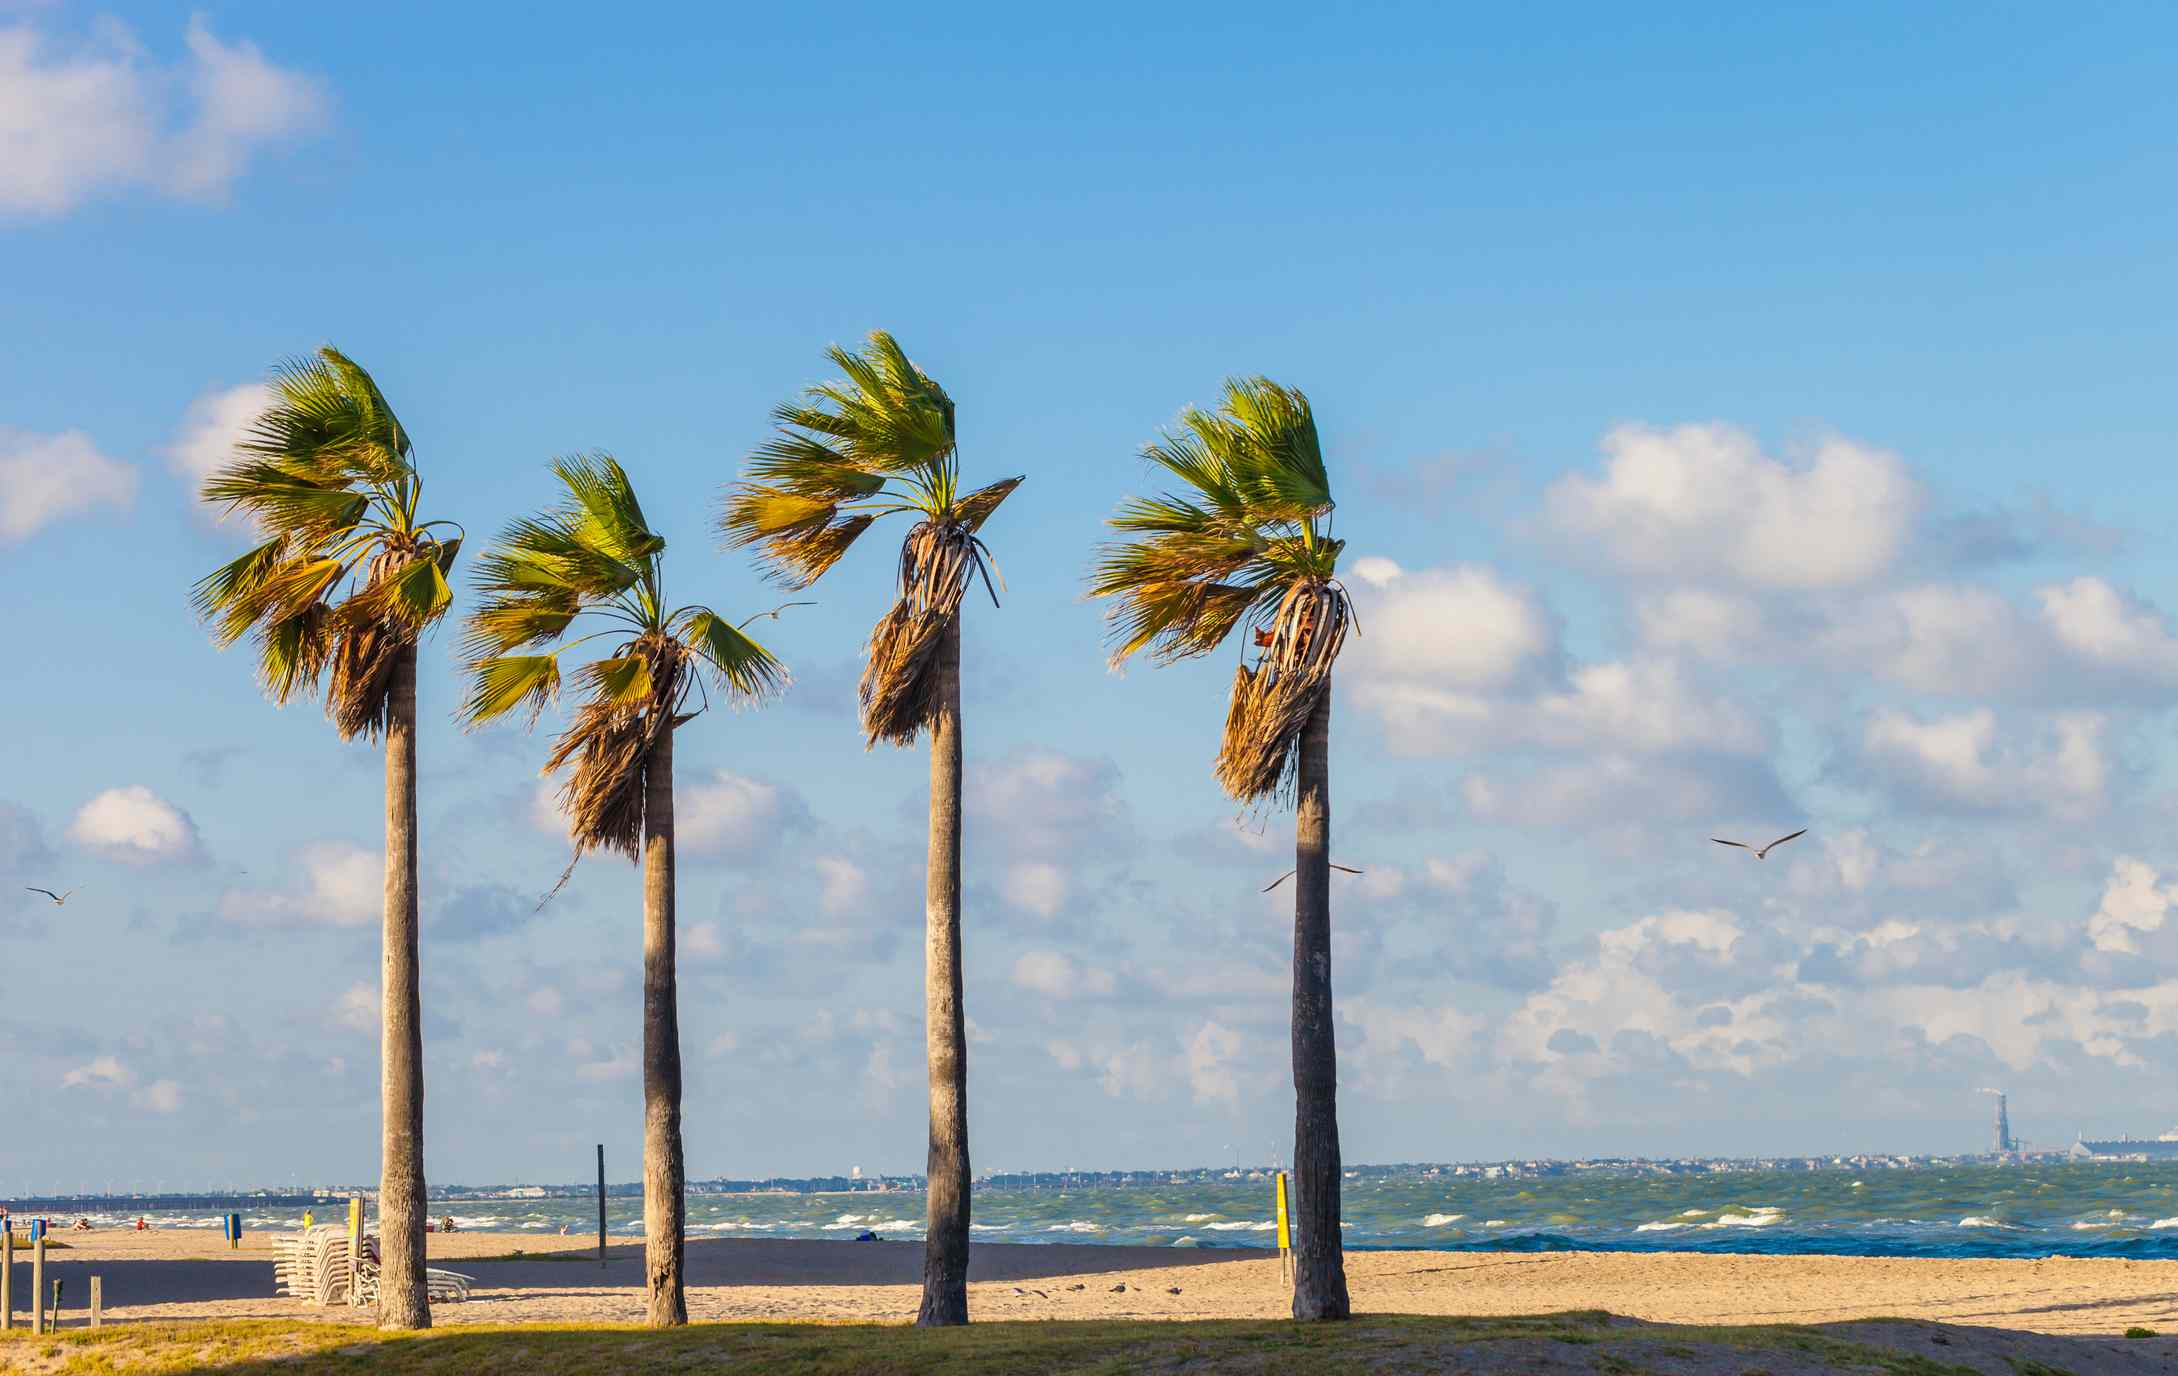 Wind-blown palm trees on the beach in Corpus Christi